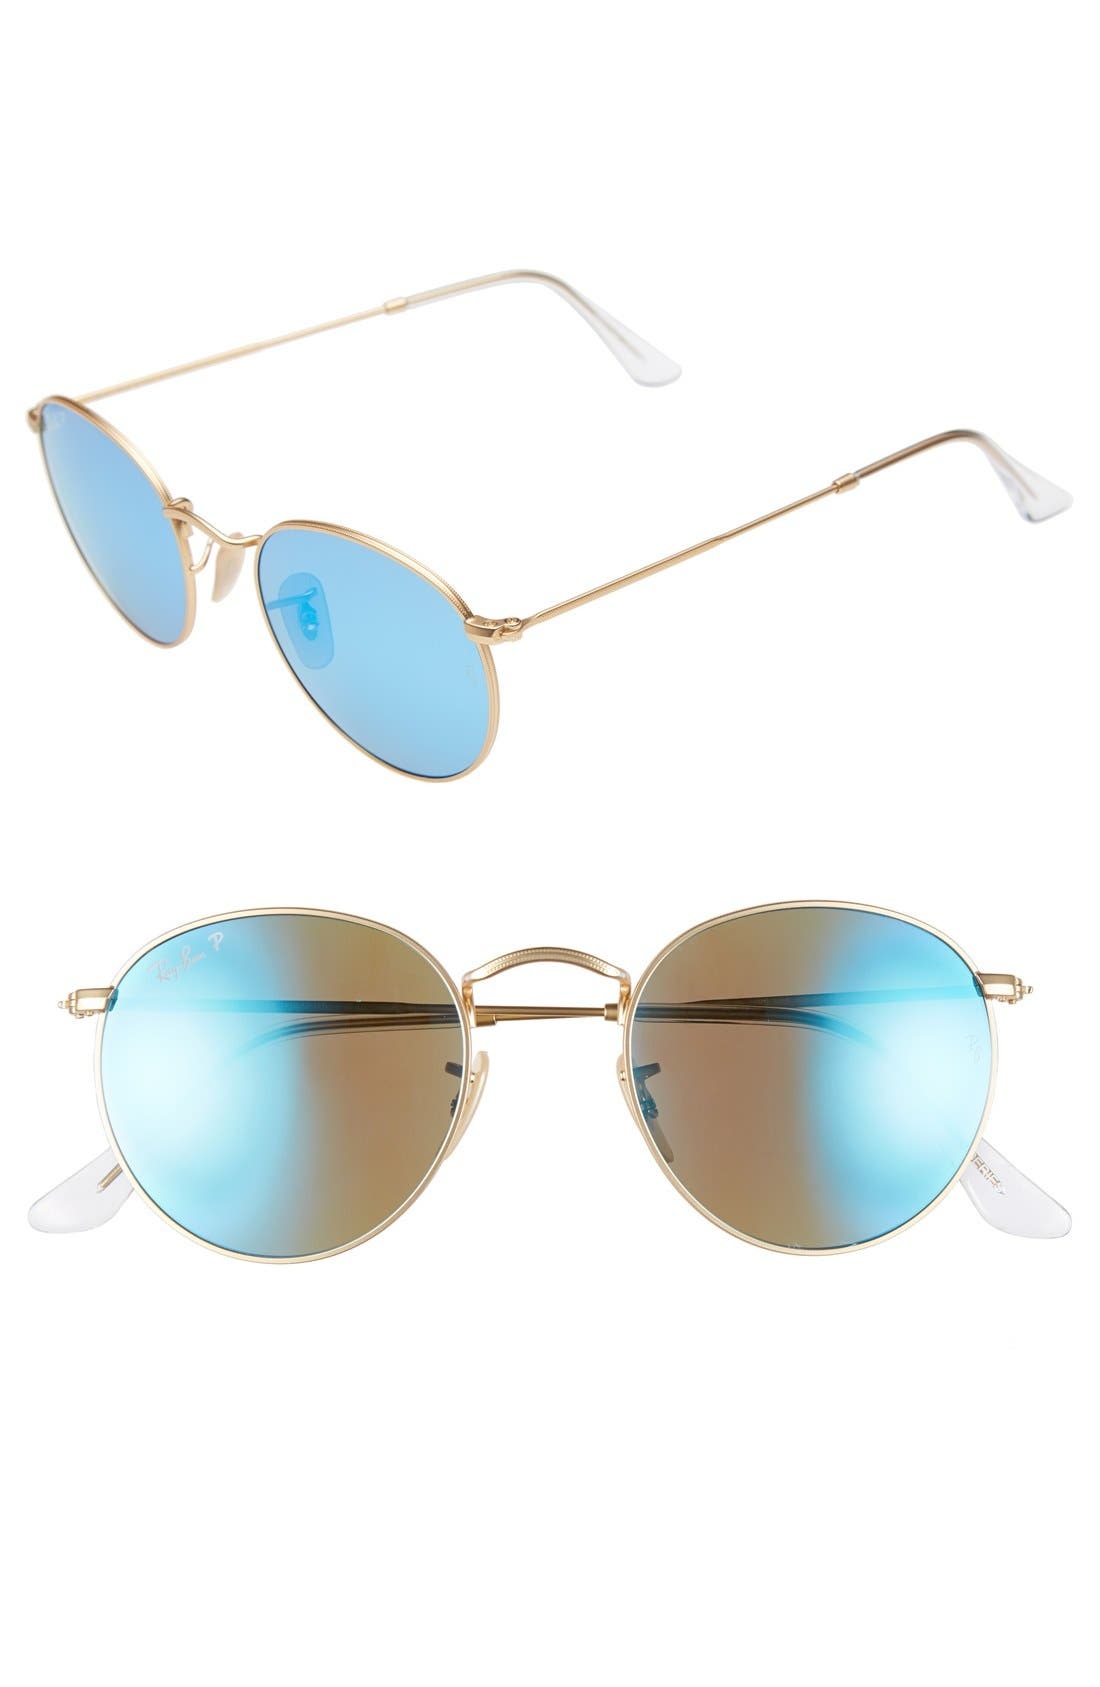 RAY-BAN, 50mm Round Polarized Sunglasses, Main thumbnail 1, color, GOLD/ BLUE MIRROR